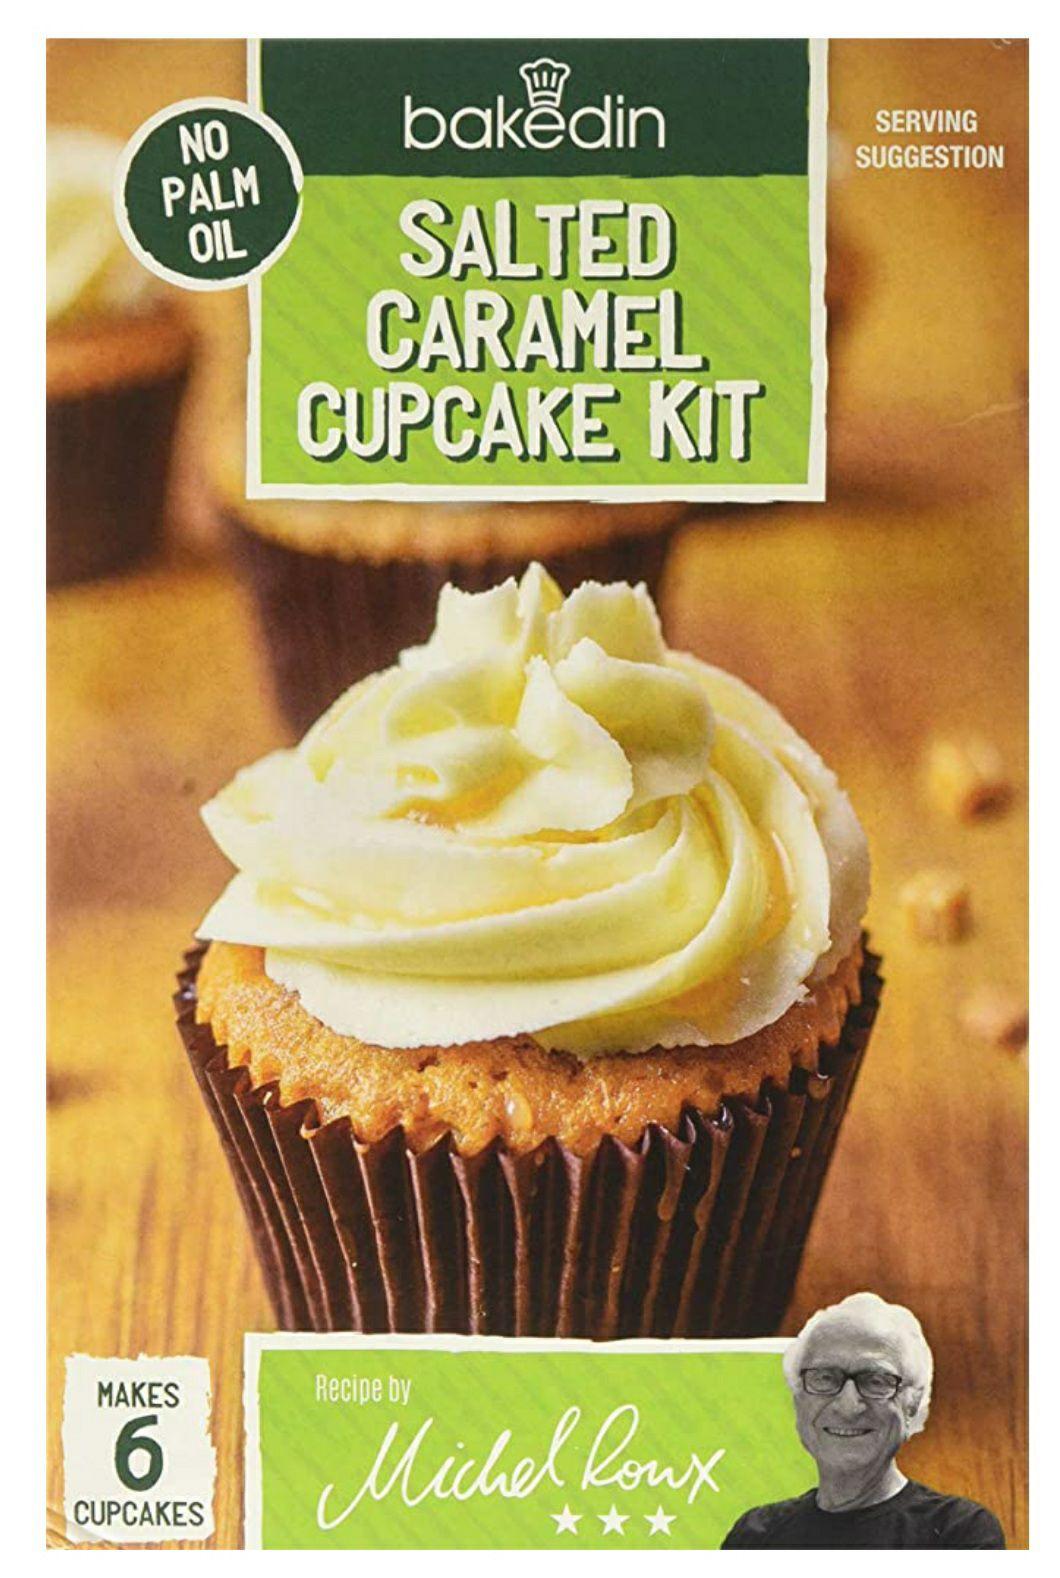 Bakedin Salted Caramel Cupcake Kit, 375 Gram £1.87 + £4.49 NP @ Amazon